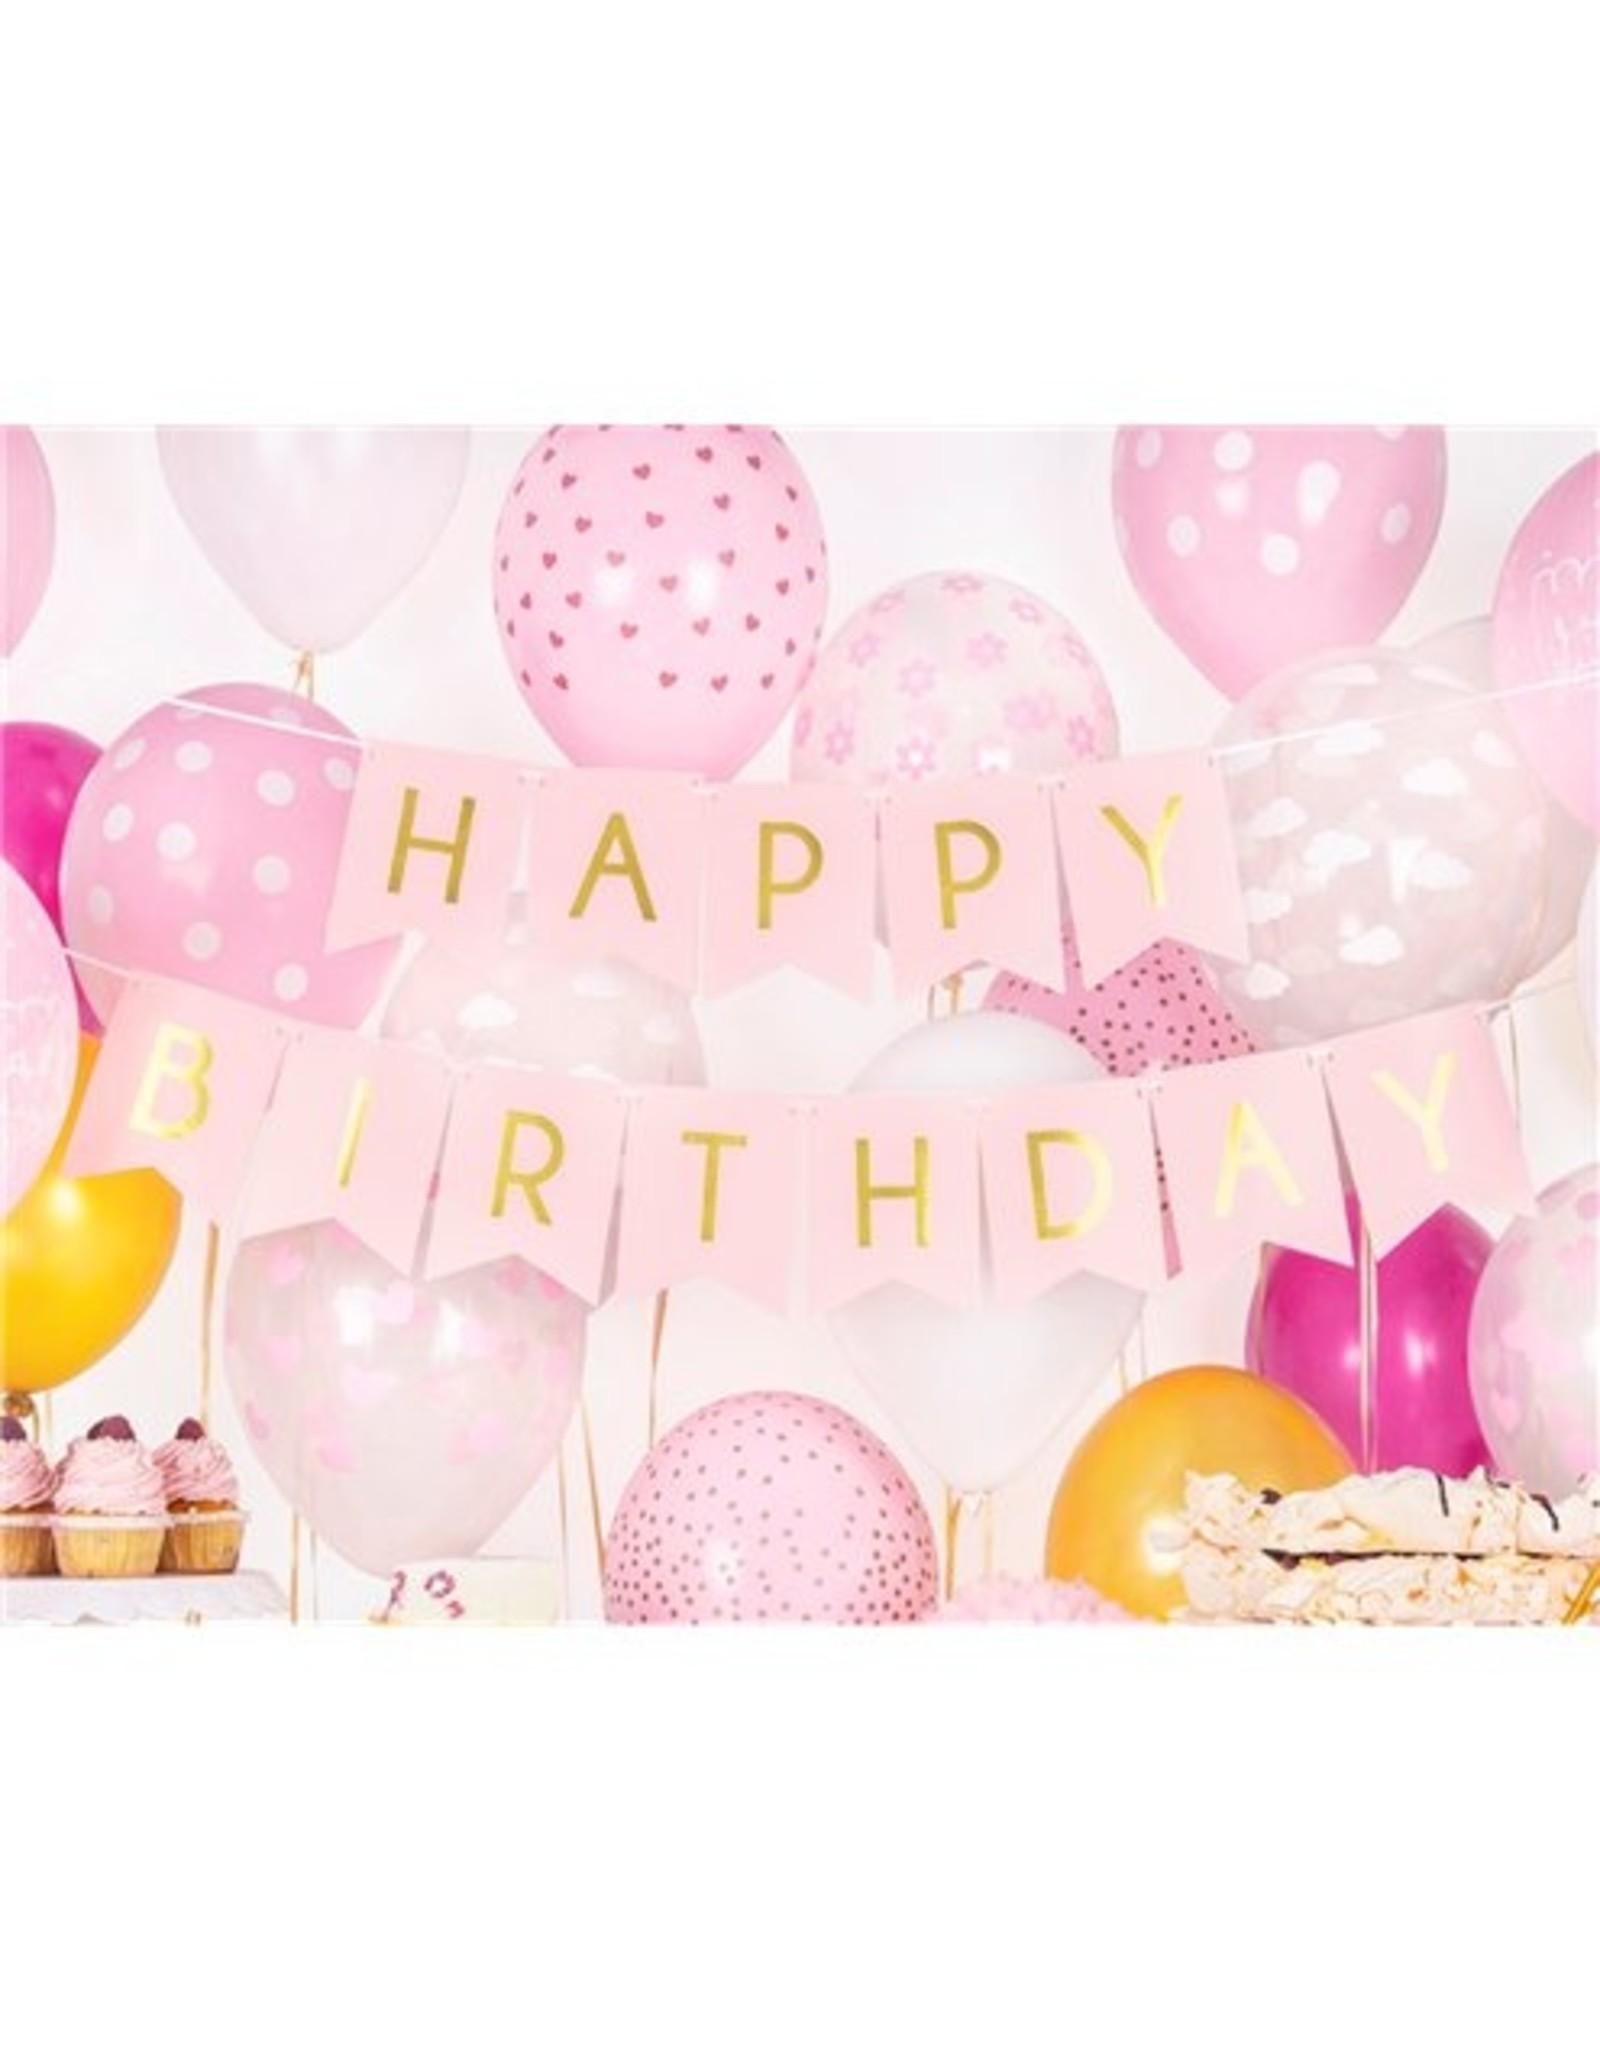 Happy birthday banner pink